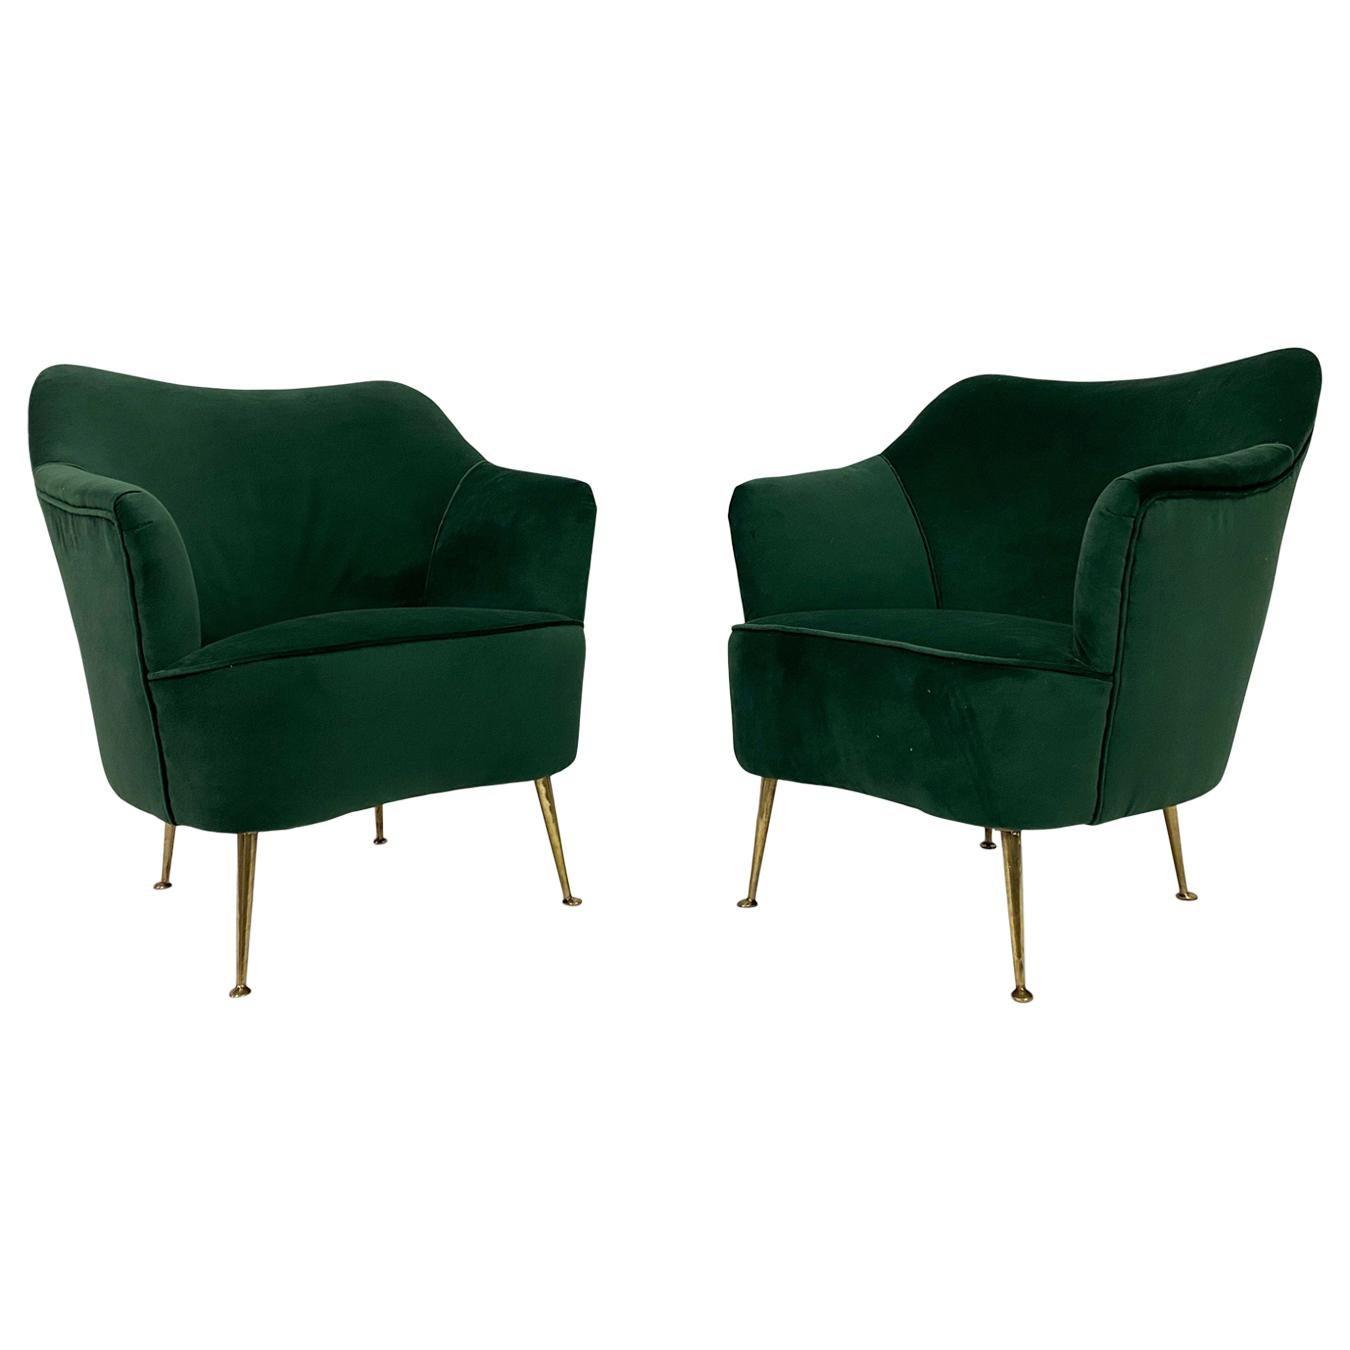 Midcentury Pair of 1950s Italian Armchairs in Green Velvet